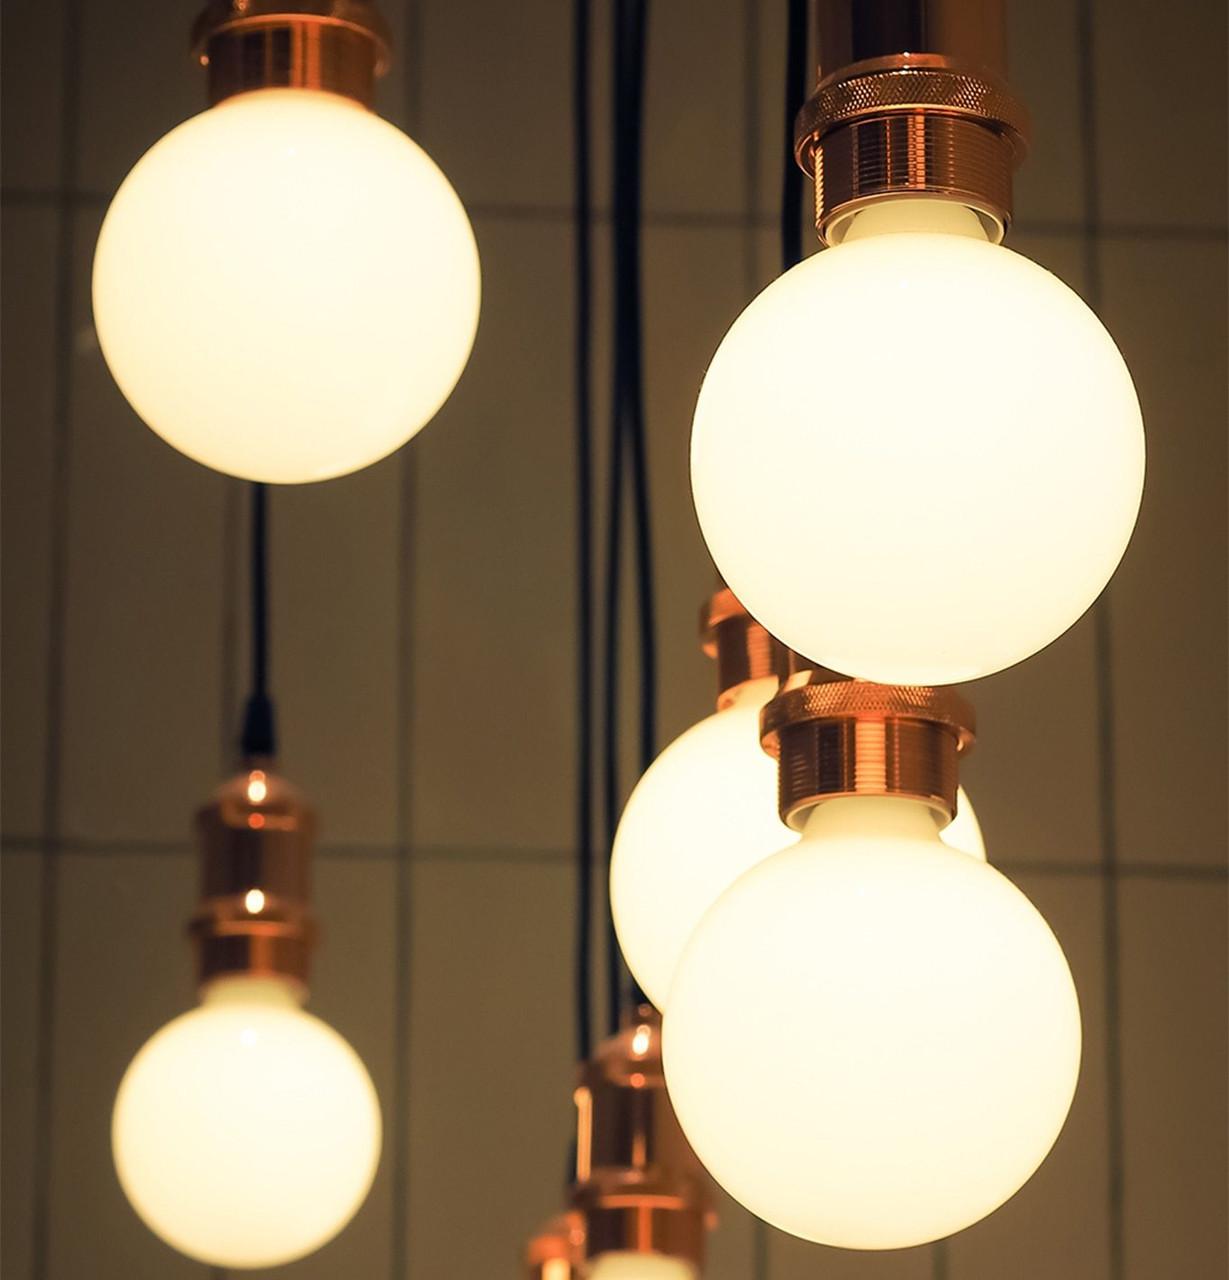 LED G125 Antique Bronze Light Bulbs